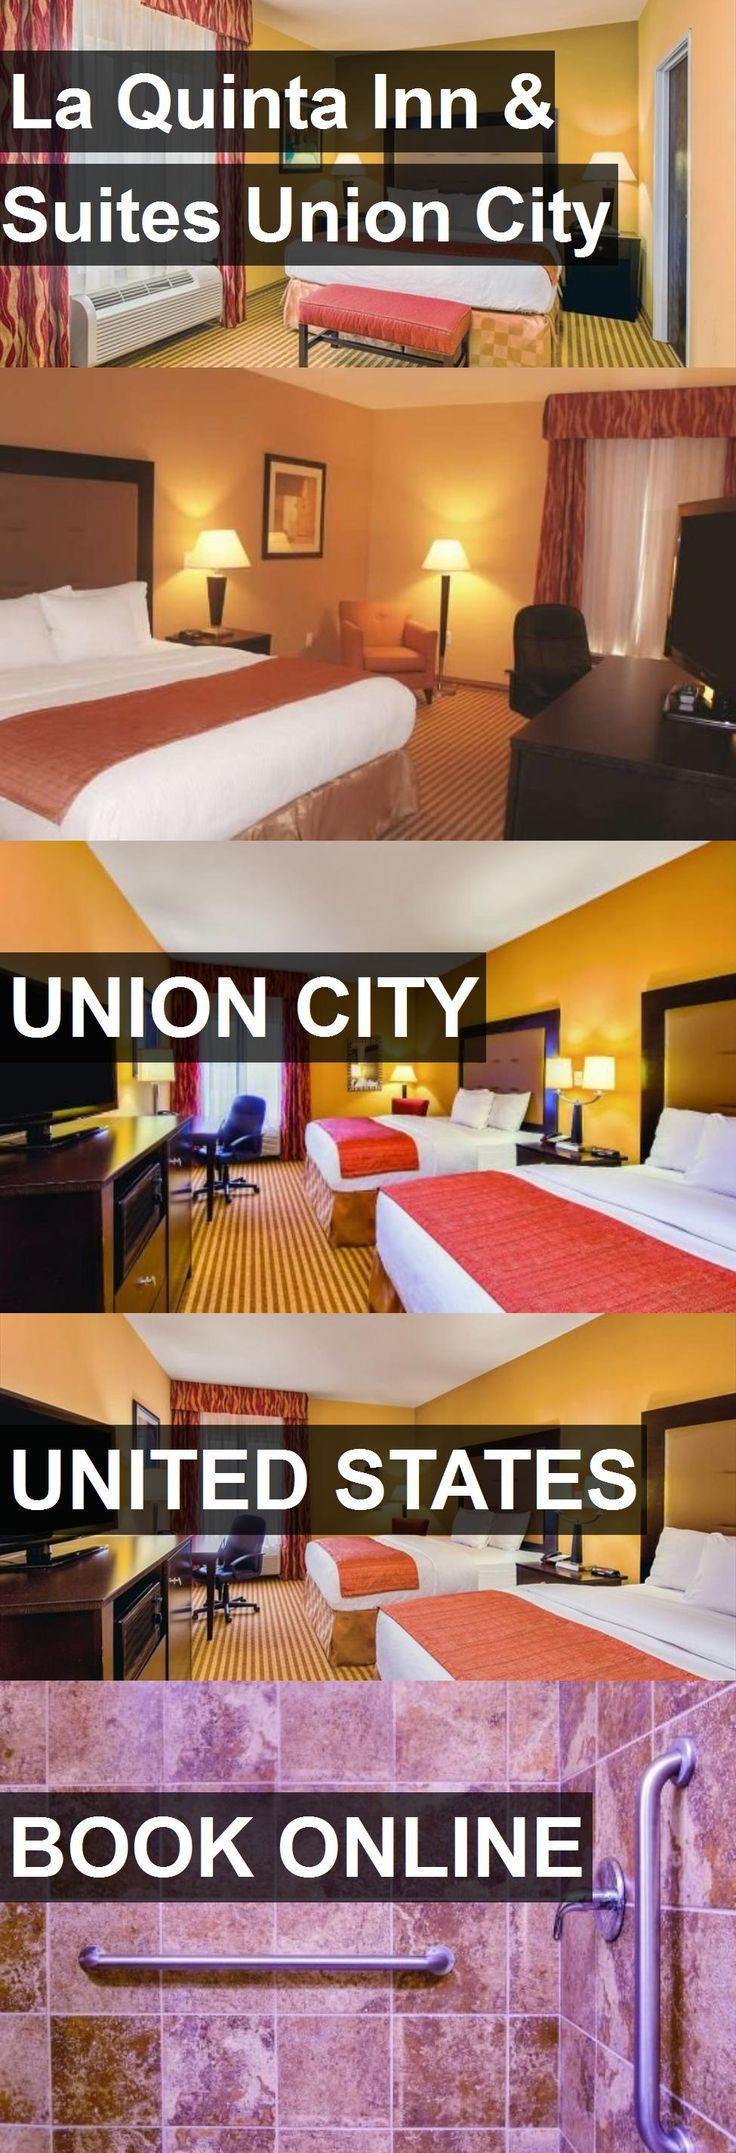 Hotel La Quinta Inn